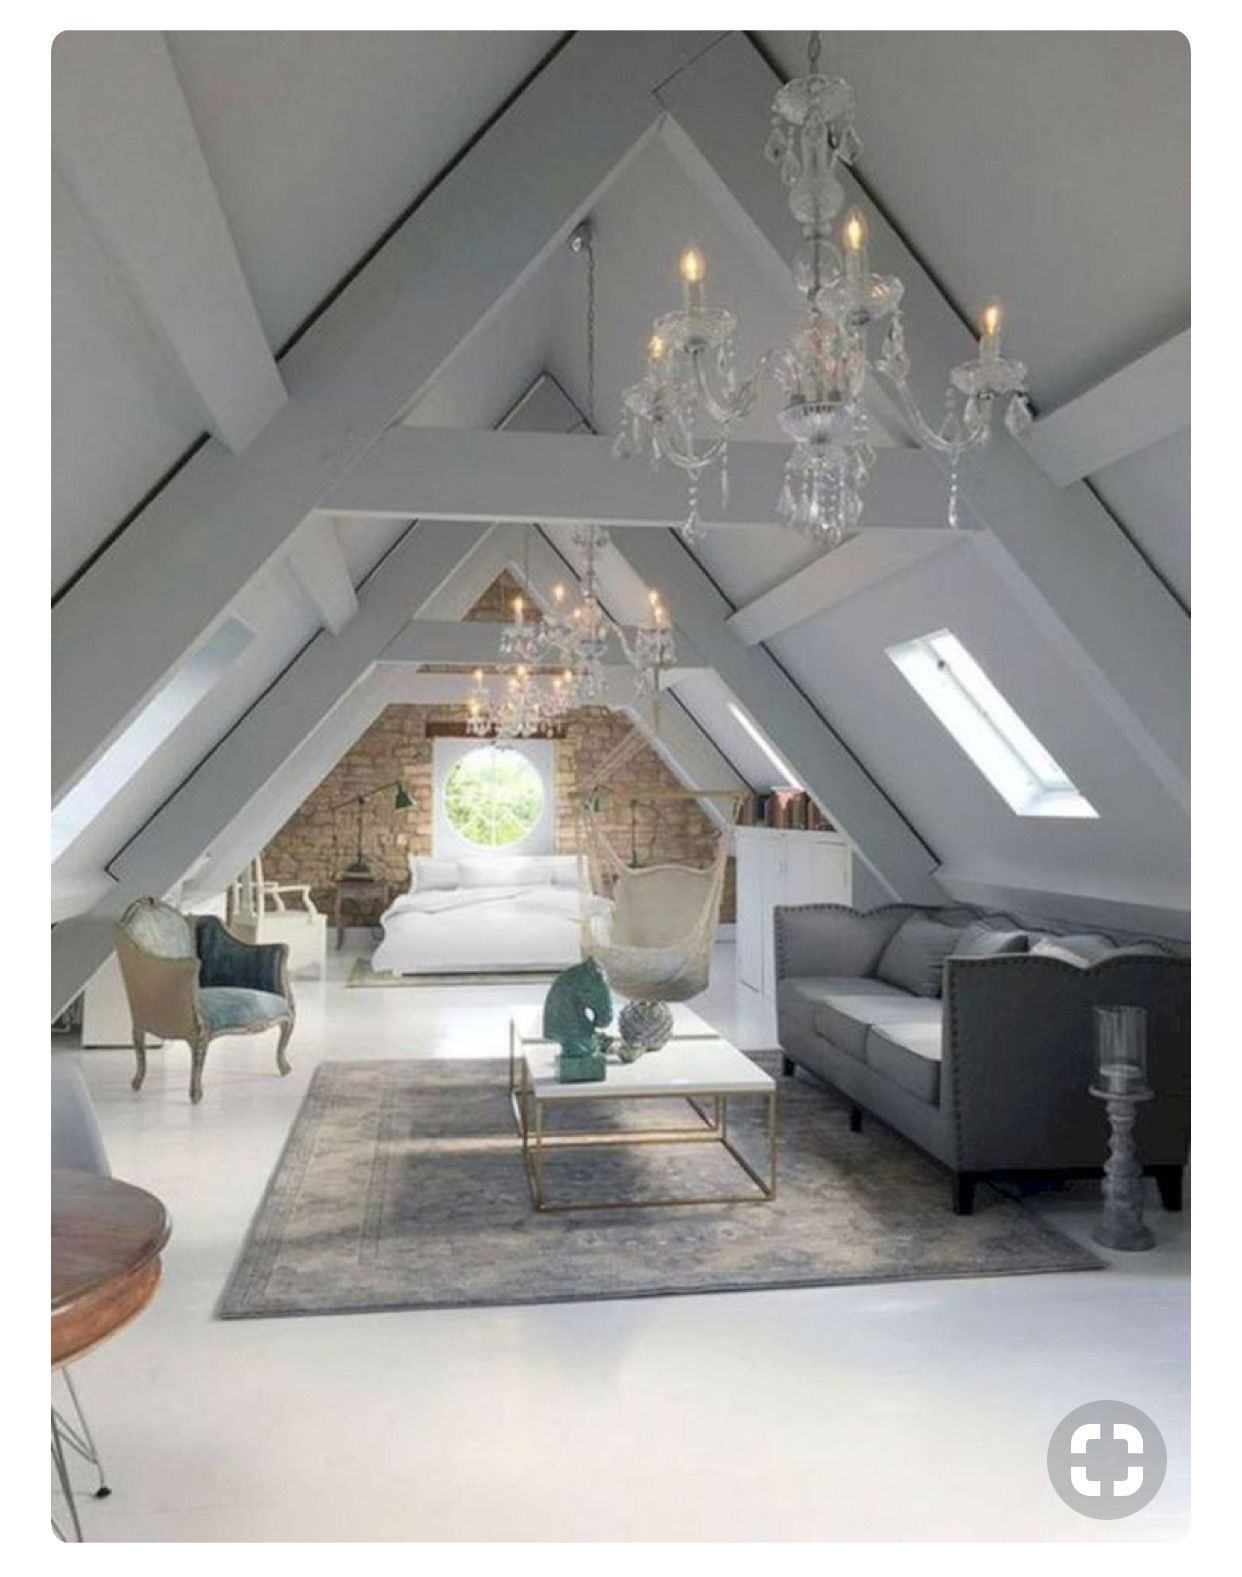 pin von larissa hartig auf dachgeschoss in 2018 pinterest dachboden dachgeschosse und. Black Bedroom Furniture Sets. Home Design Ideas